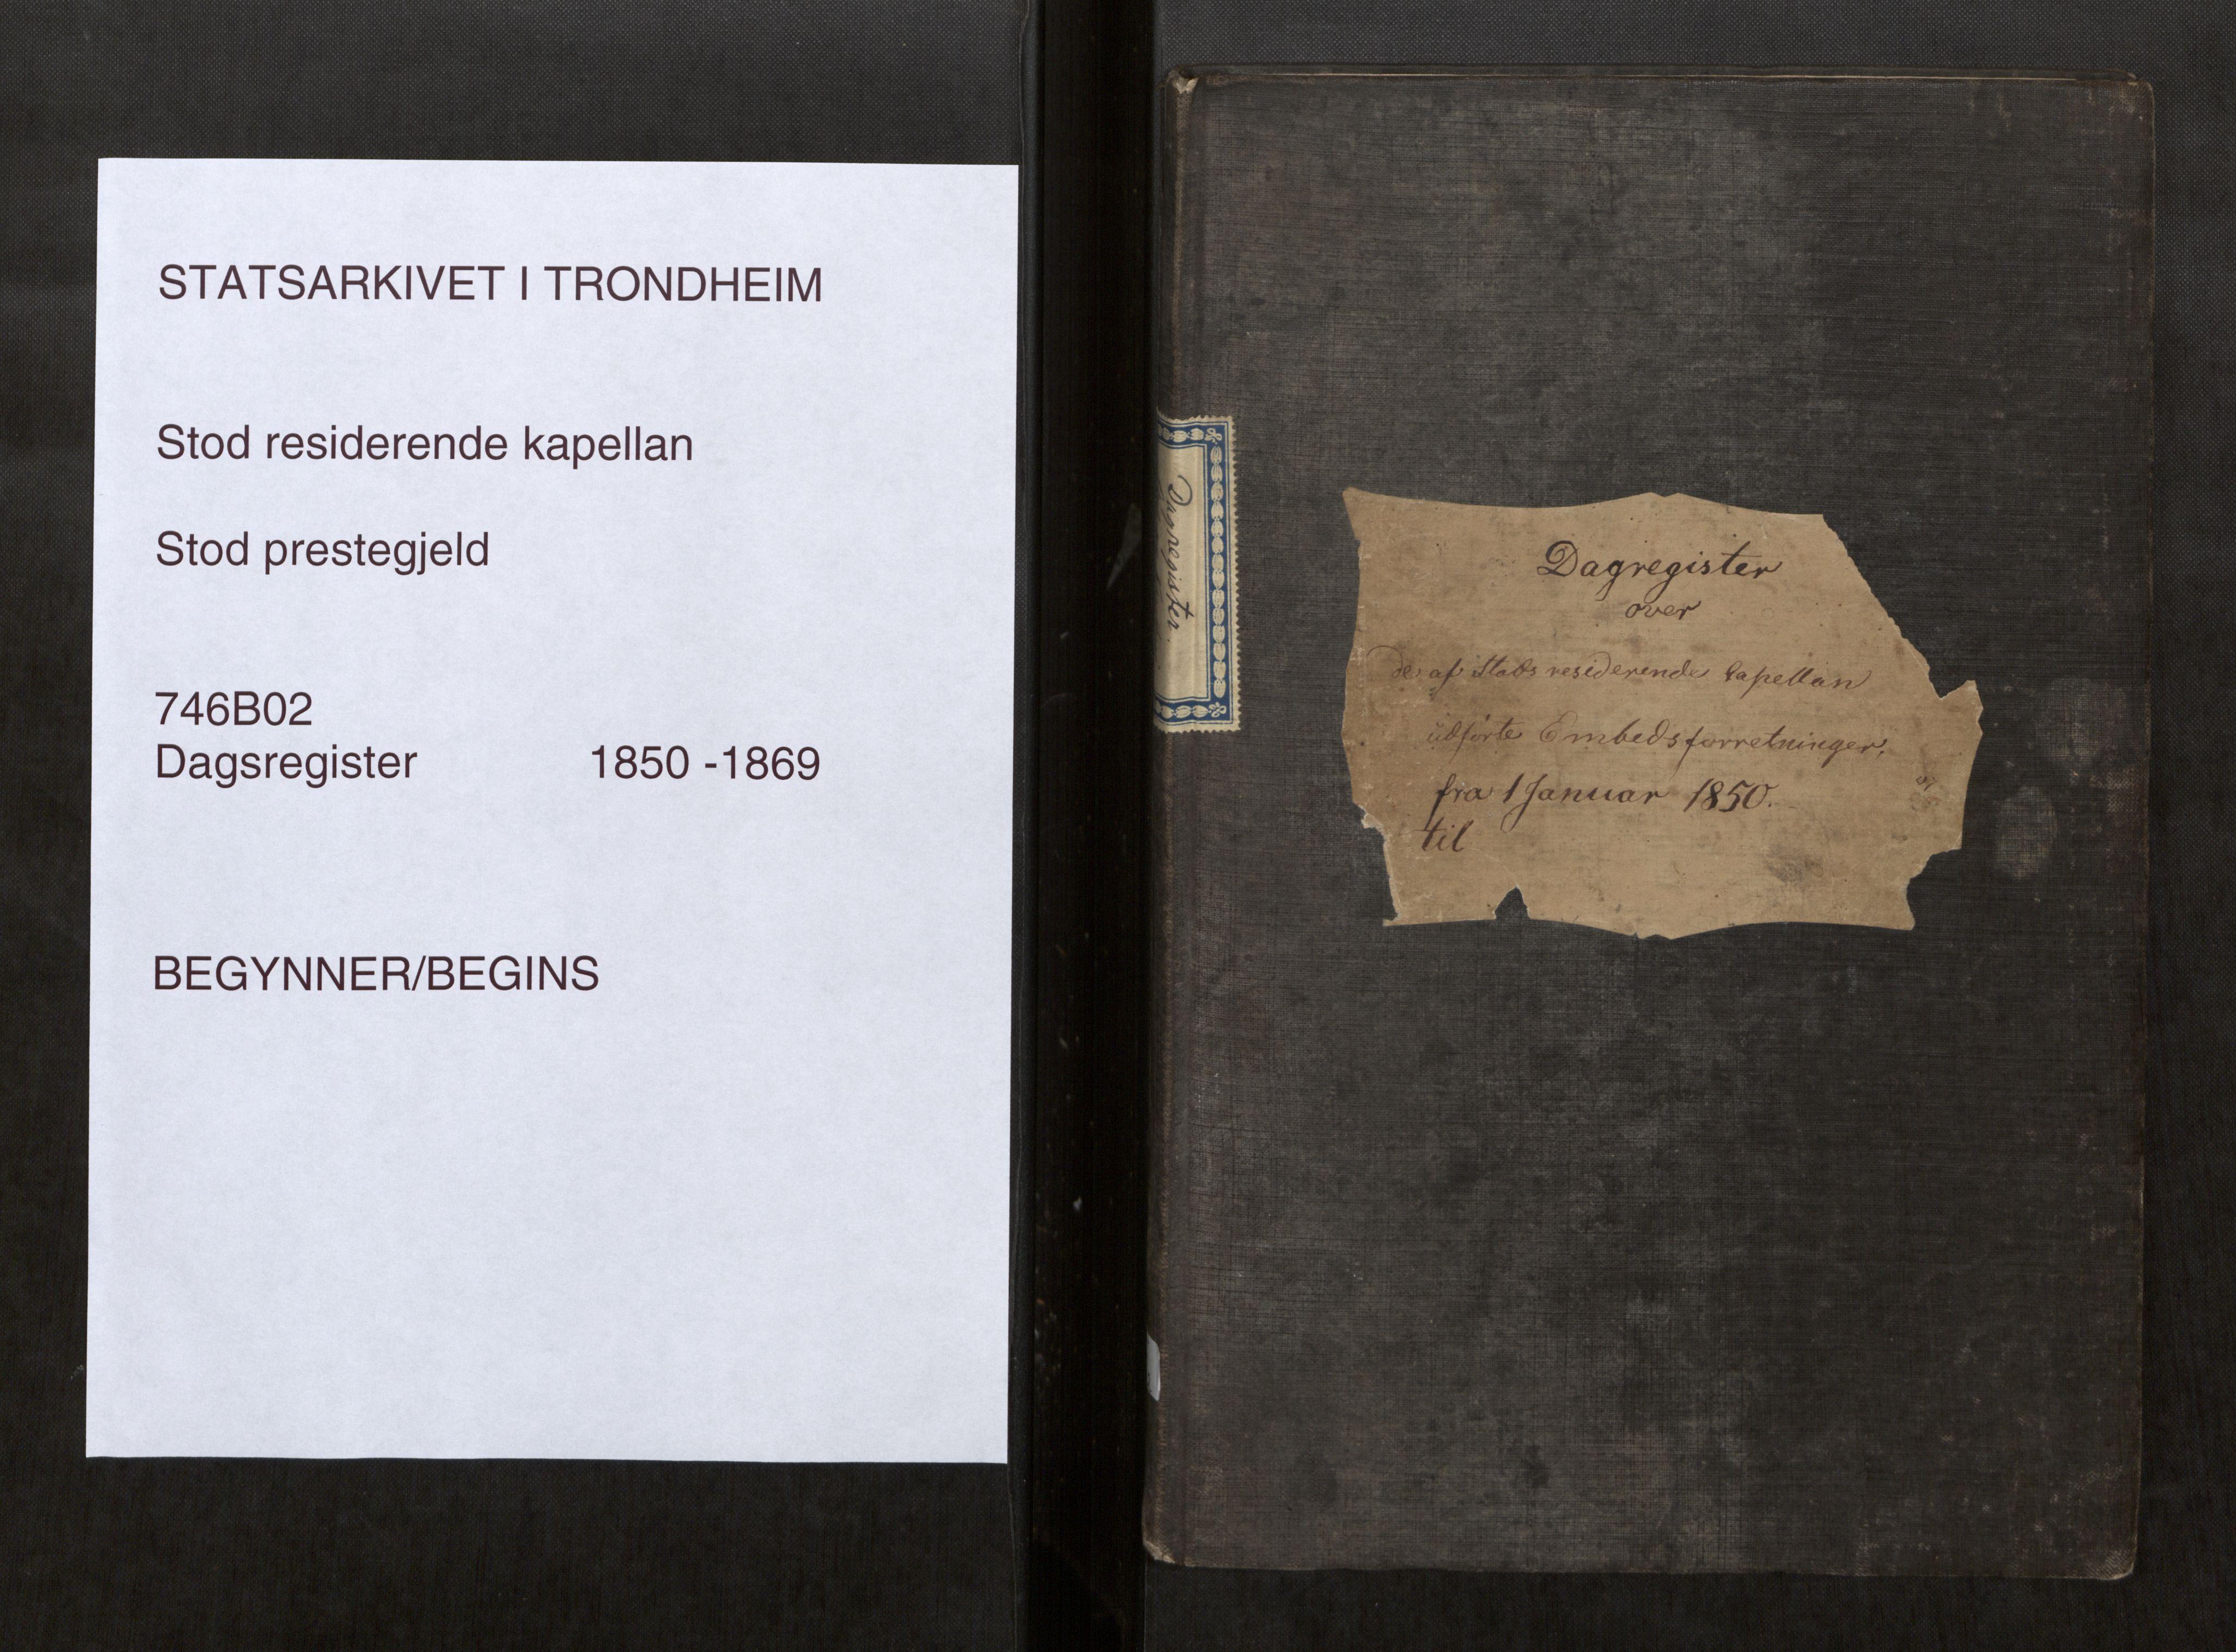 SAT, Stod sokneprestkontor, I/I1/I1d/L0002: Curate's parish register no. 2, 1850-1869